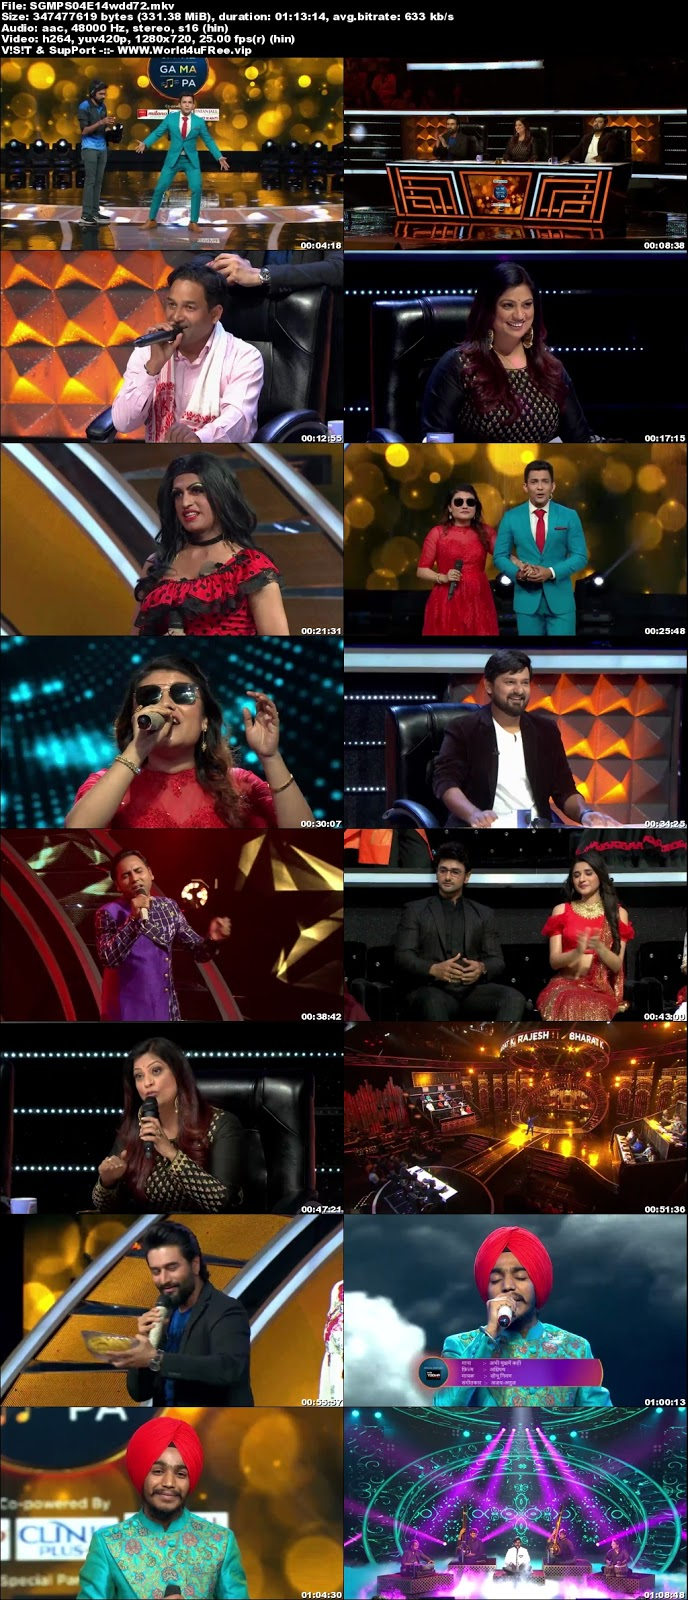 Sa Re Ga Ma Pa 2018 S04 Episode 14 720p WEBRip 300Mb x264 world4ufree.fun tv show Sa Re Ga Ma Pa 2018 S04 2018 hindi Zee tv show compressed small size free download or watch online at world4ufree.fun